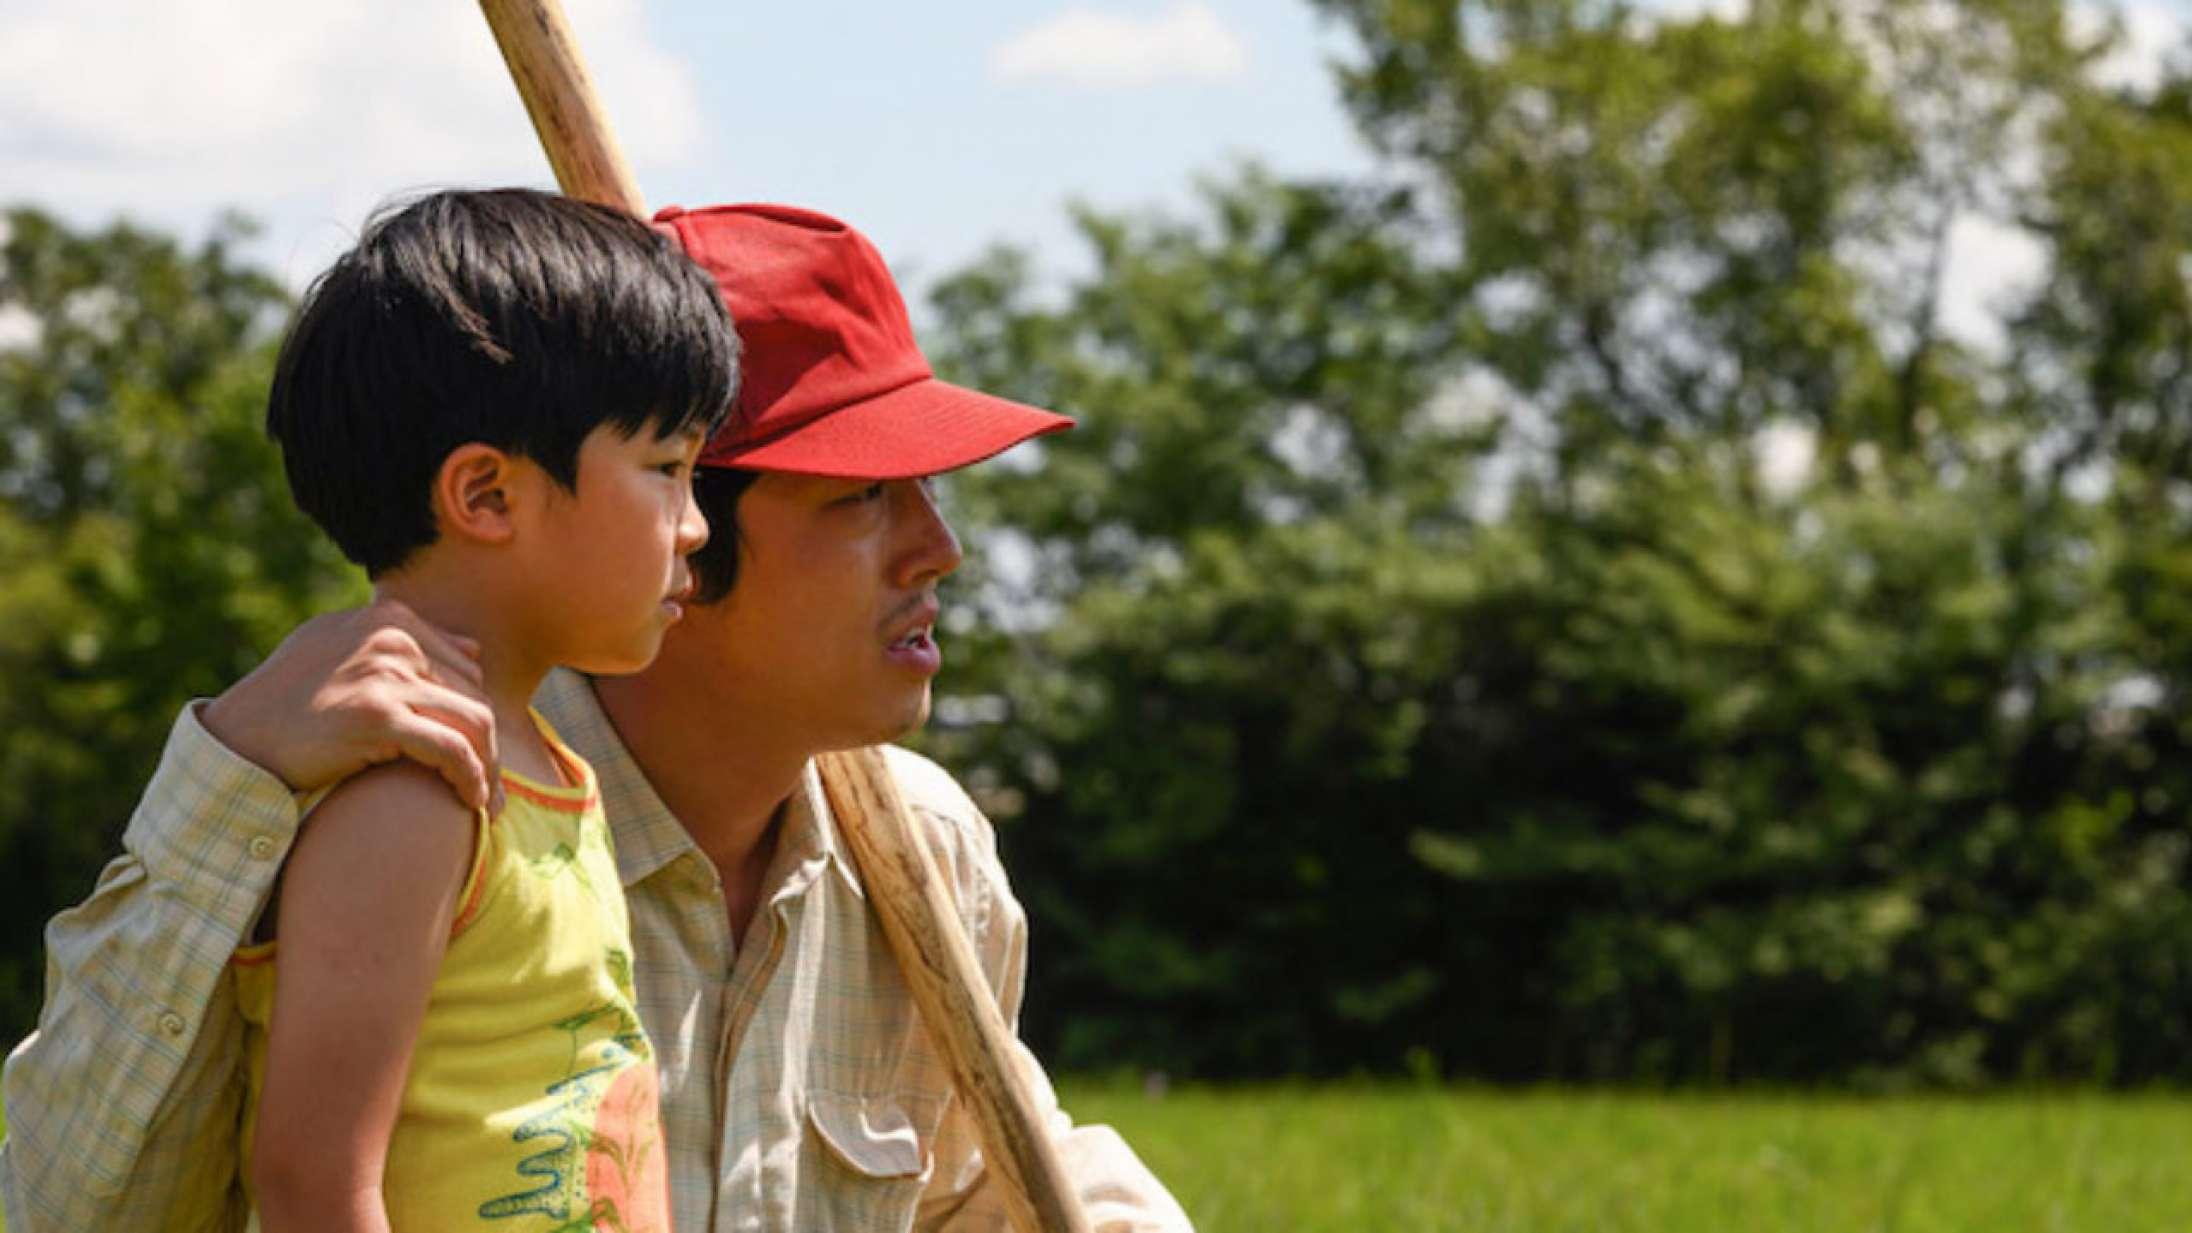 Steven Yeun jagter den amerikanske økodrøm i traileren til den hypede Sundance-vinder 'Minari'